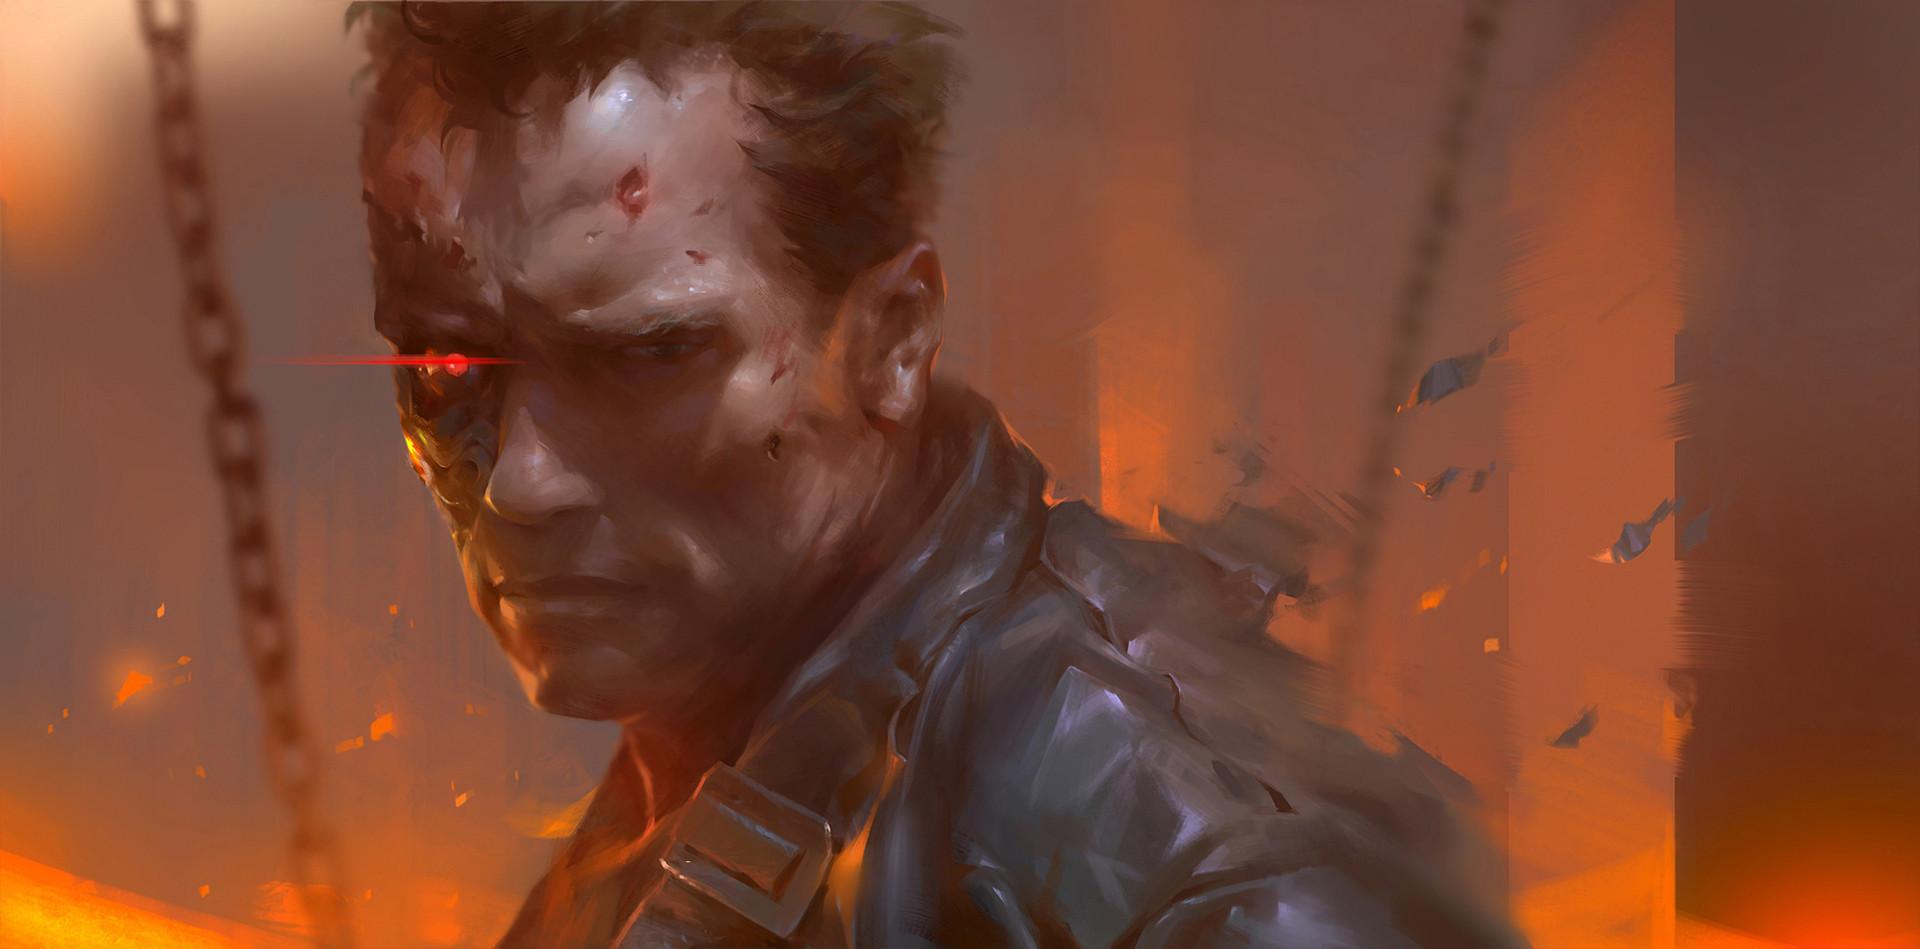 Ios Animated Wallpaper Wallpaper Terminator 2 T 800 Cyborg Arnold